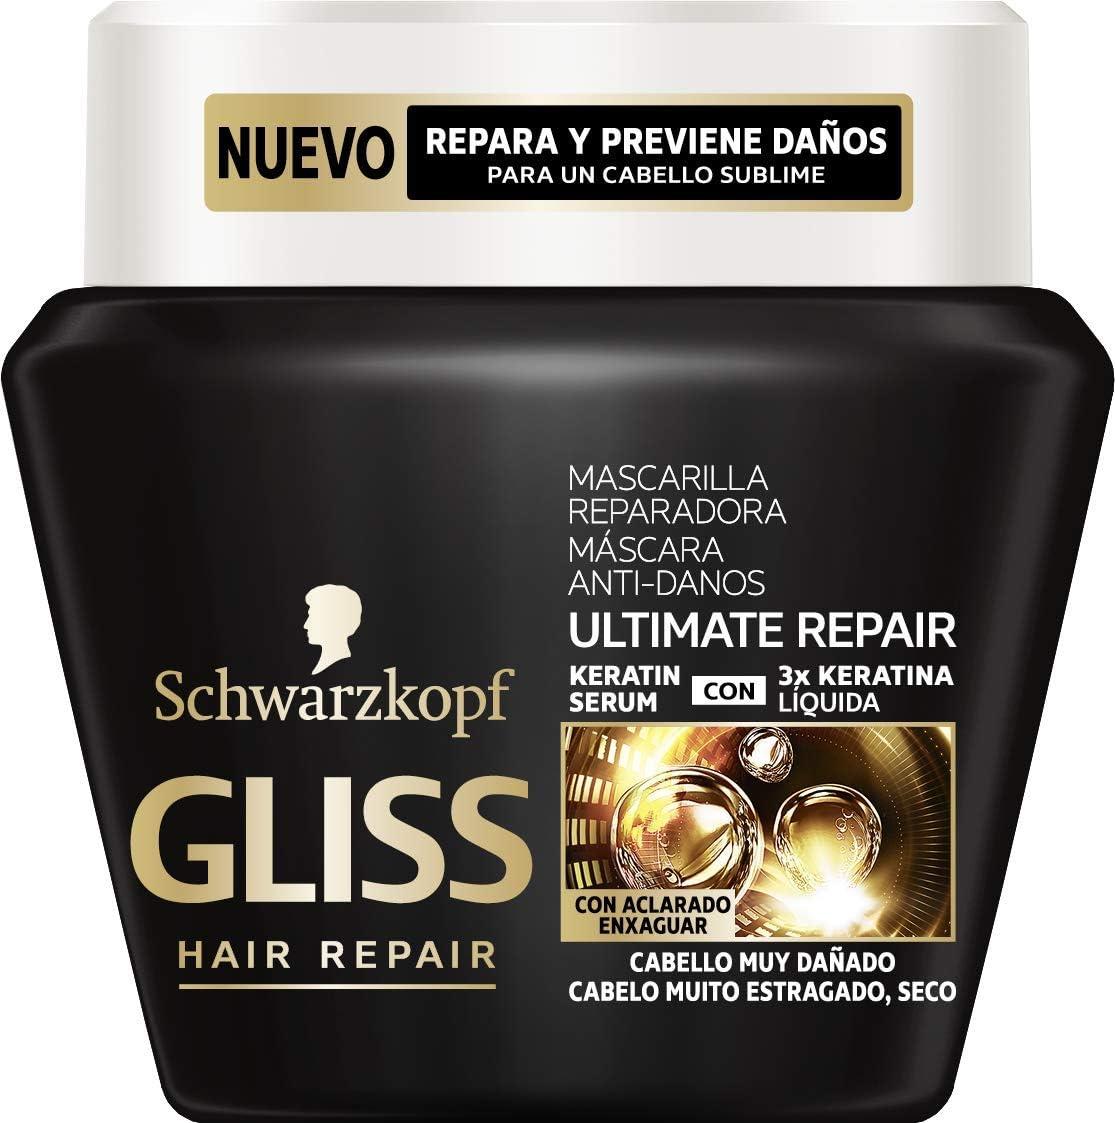 Gliss - Mascarilla Ultimate Repair para Cabellos Muy Dañados - 300ml - Schwarzkopf